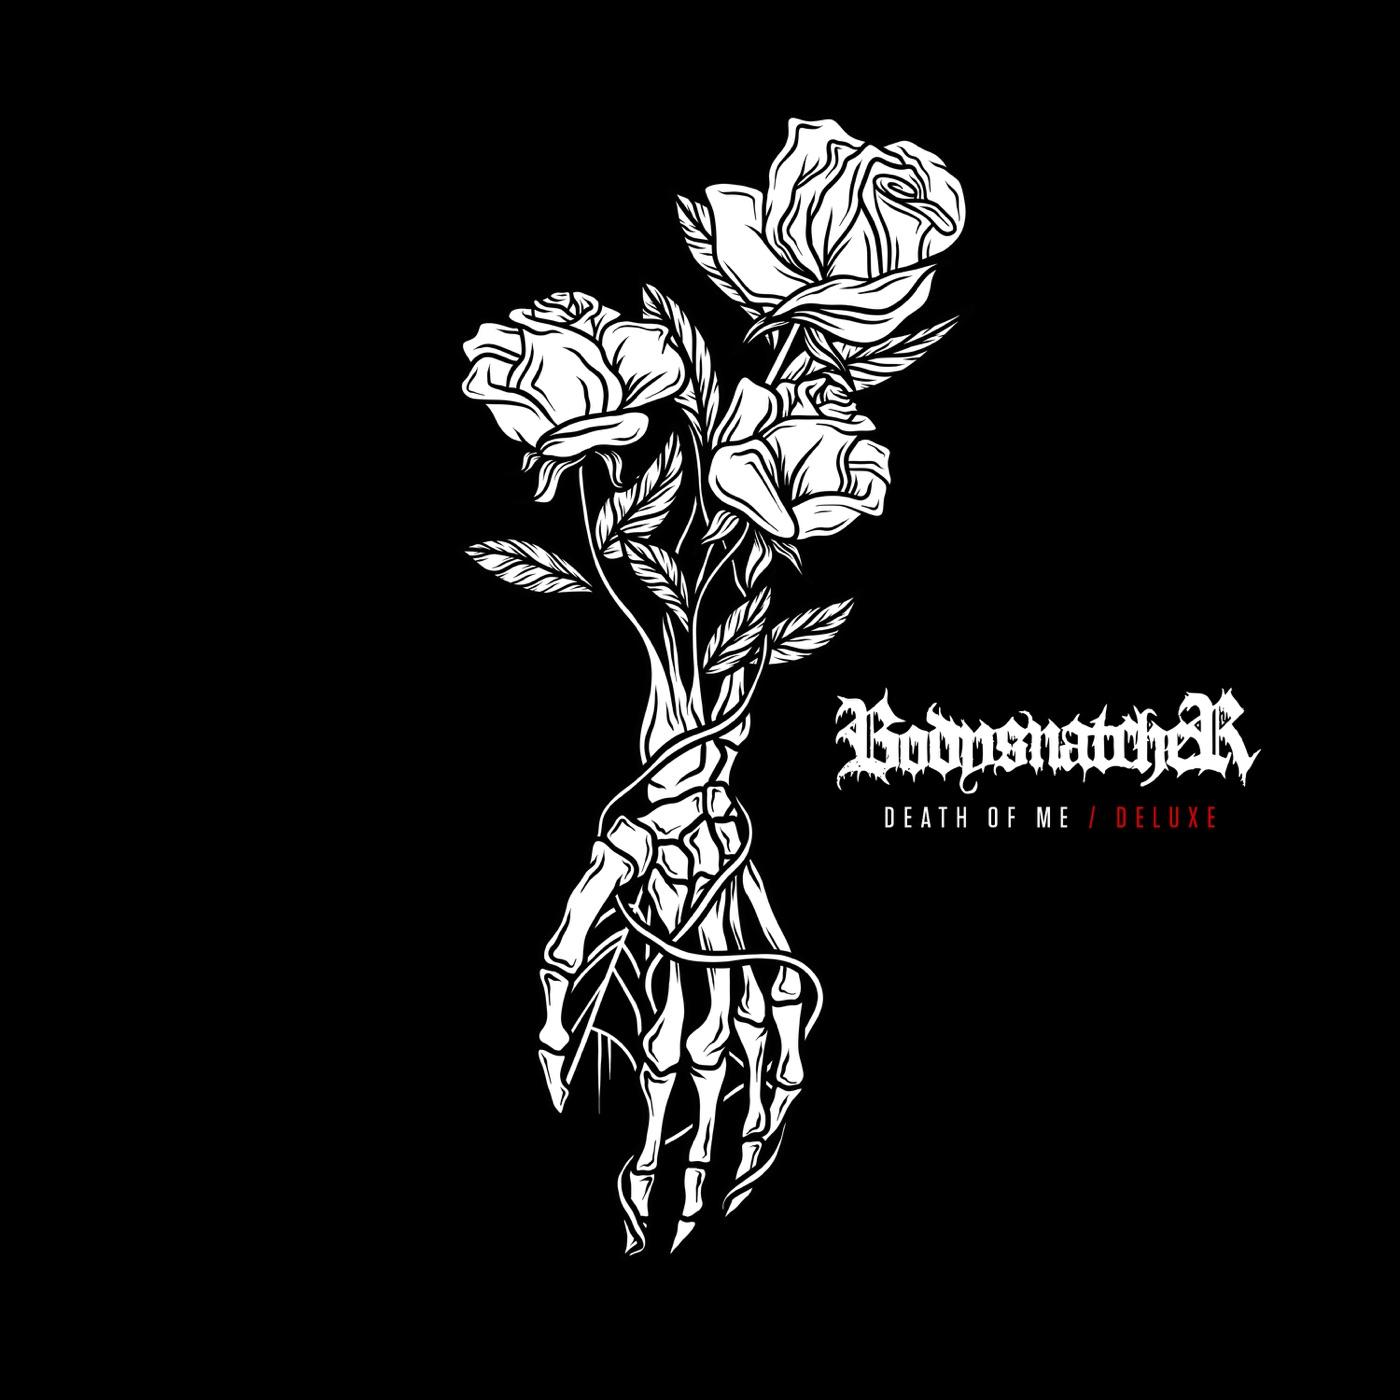 Bodysnatcher - Ego Killer [single] (2018)